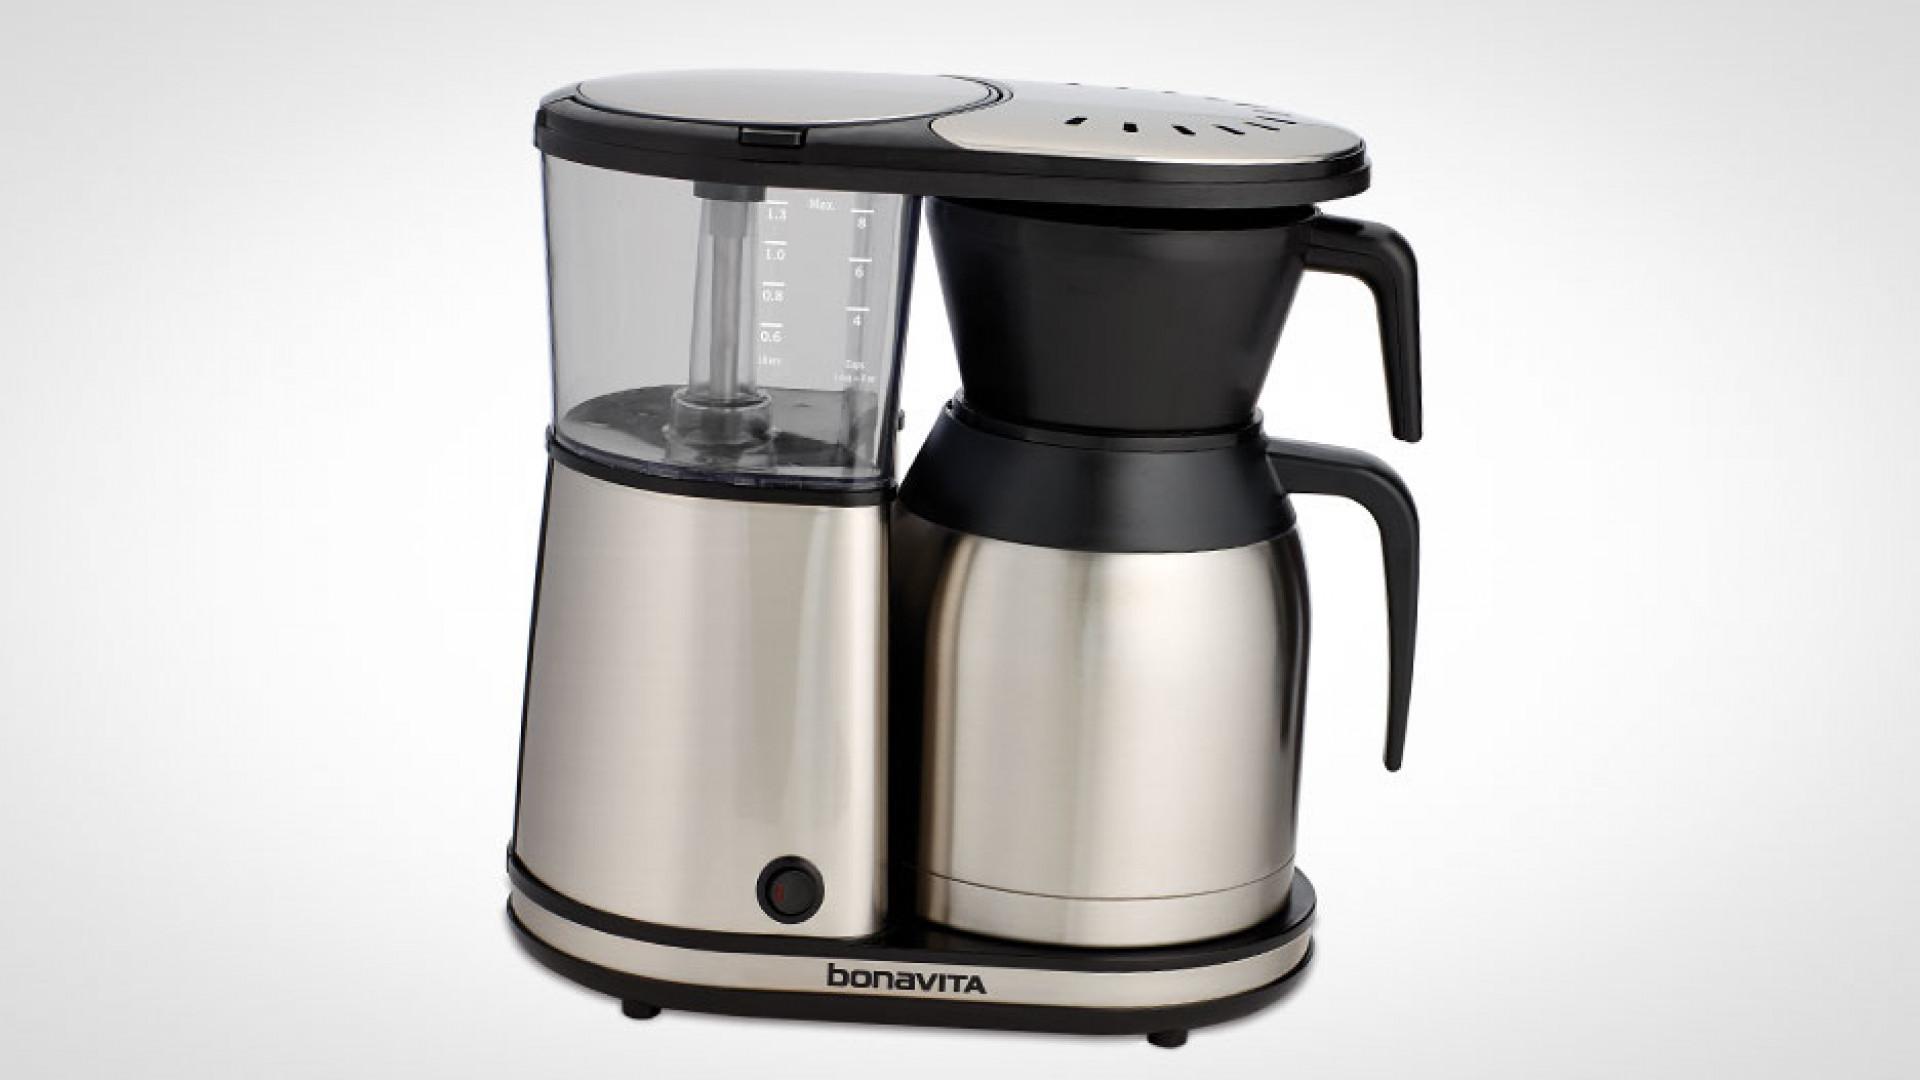 New brew hits the UK: Bonavita BV1900TS 8-Cup Coffee Maker Foodism